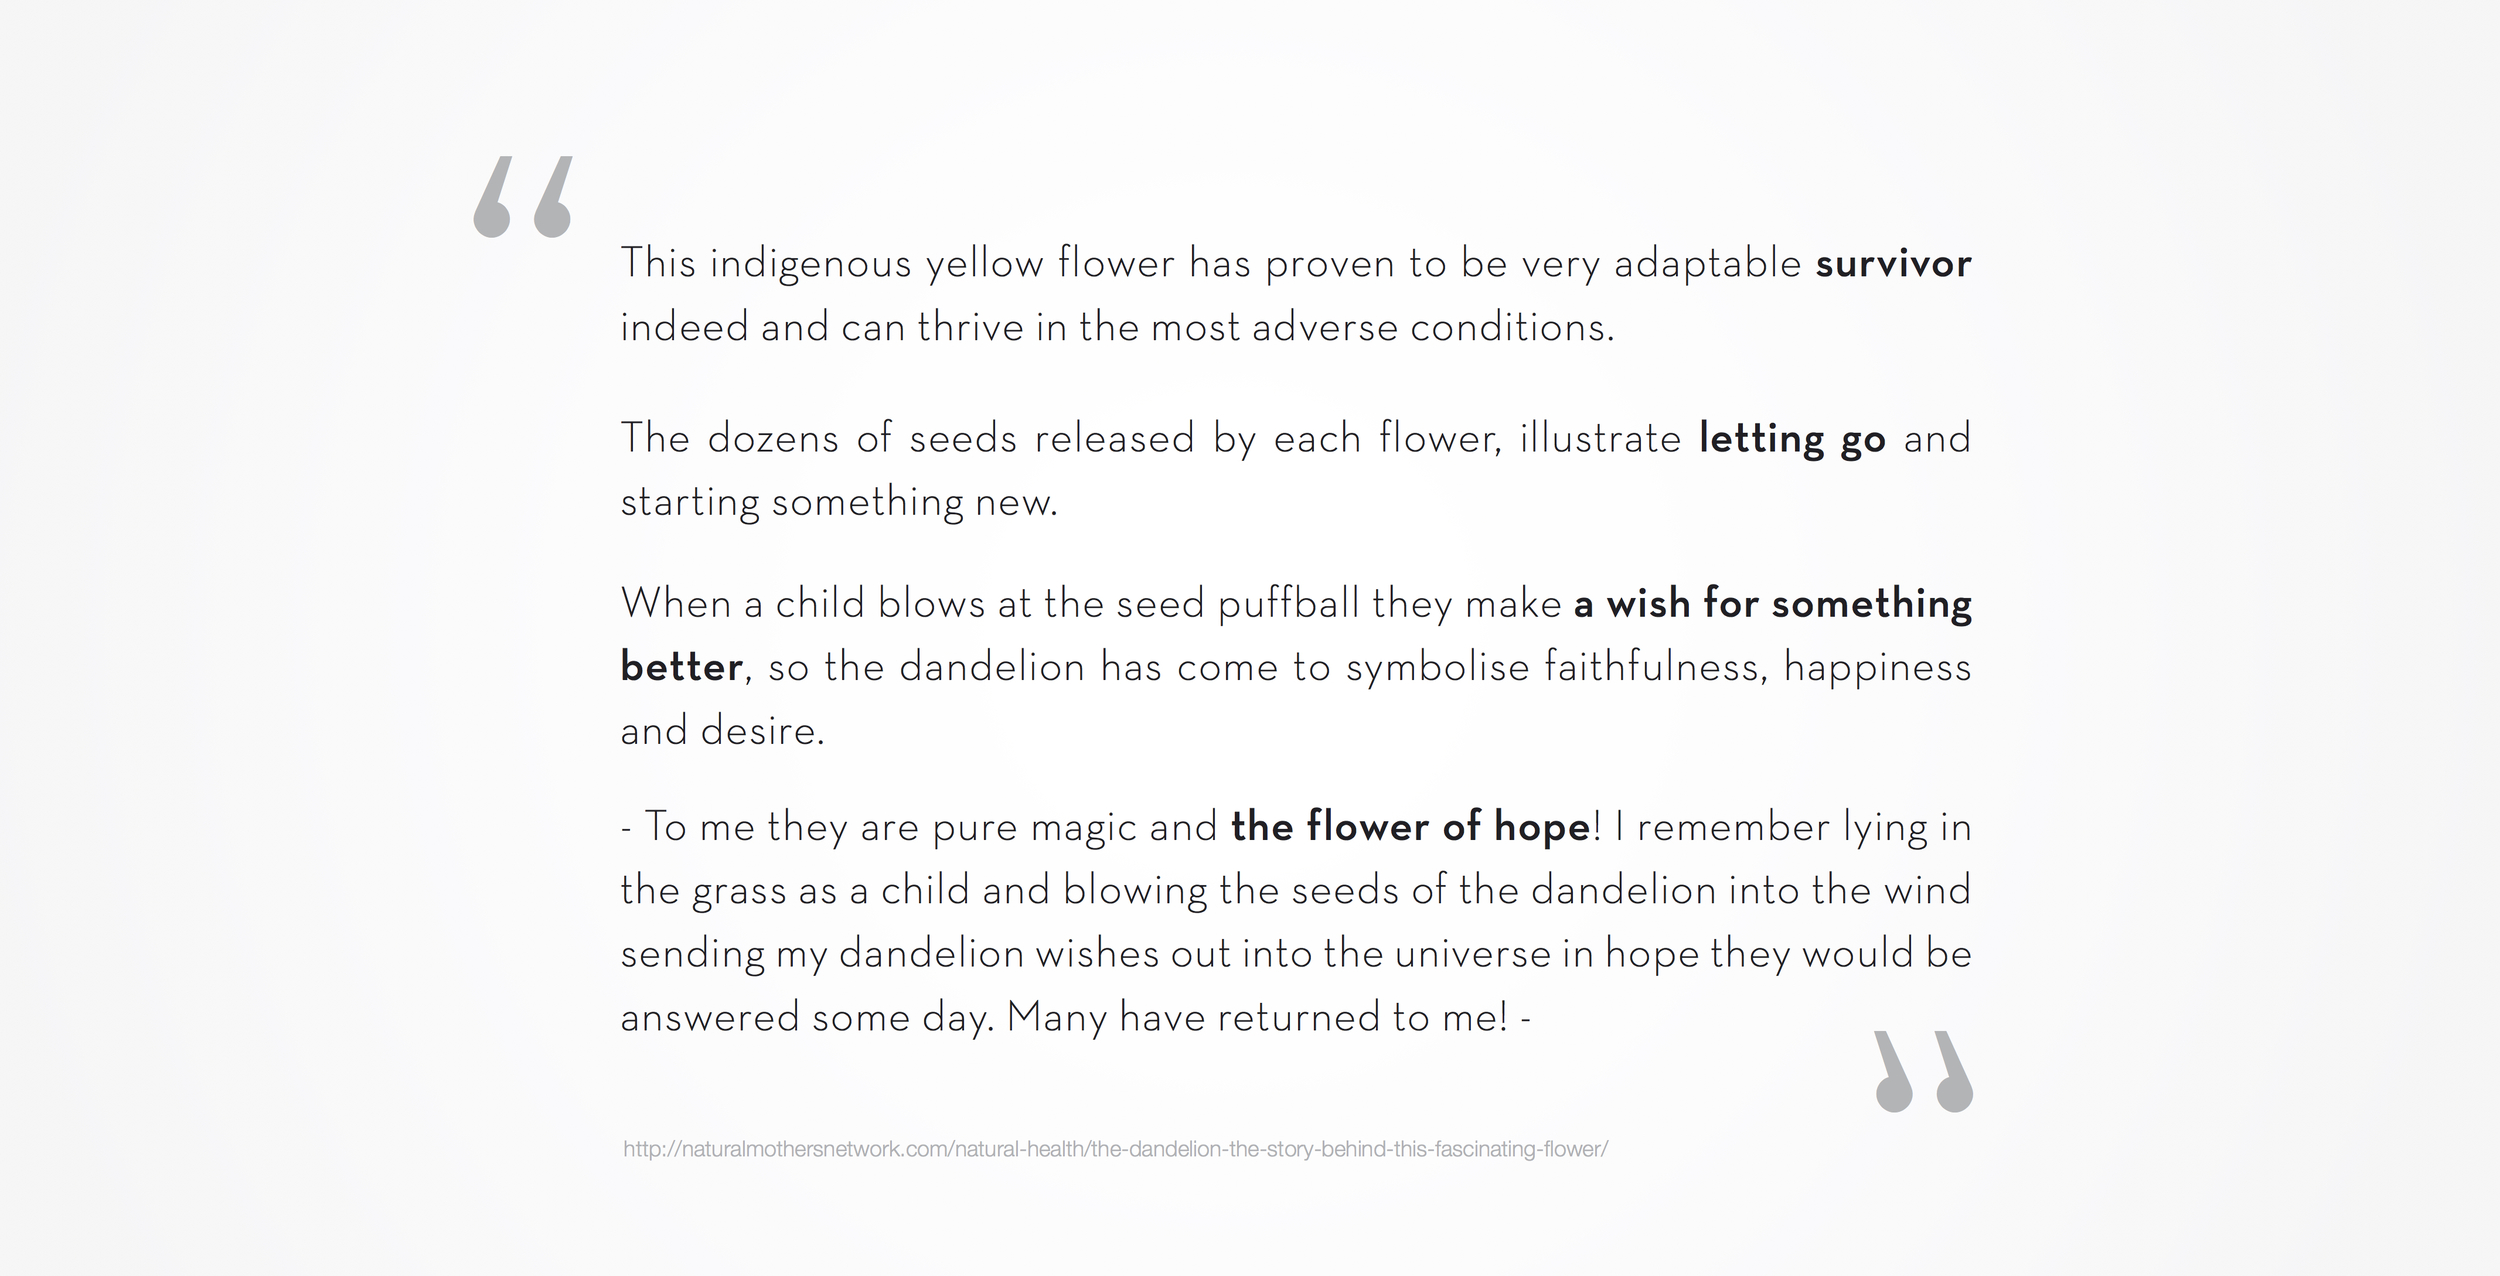 dandelion meaning symbolize logo